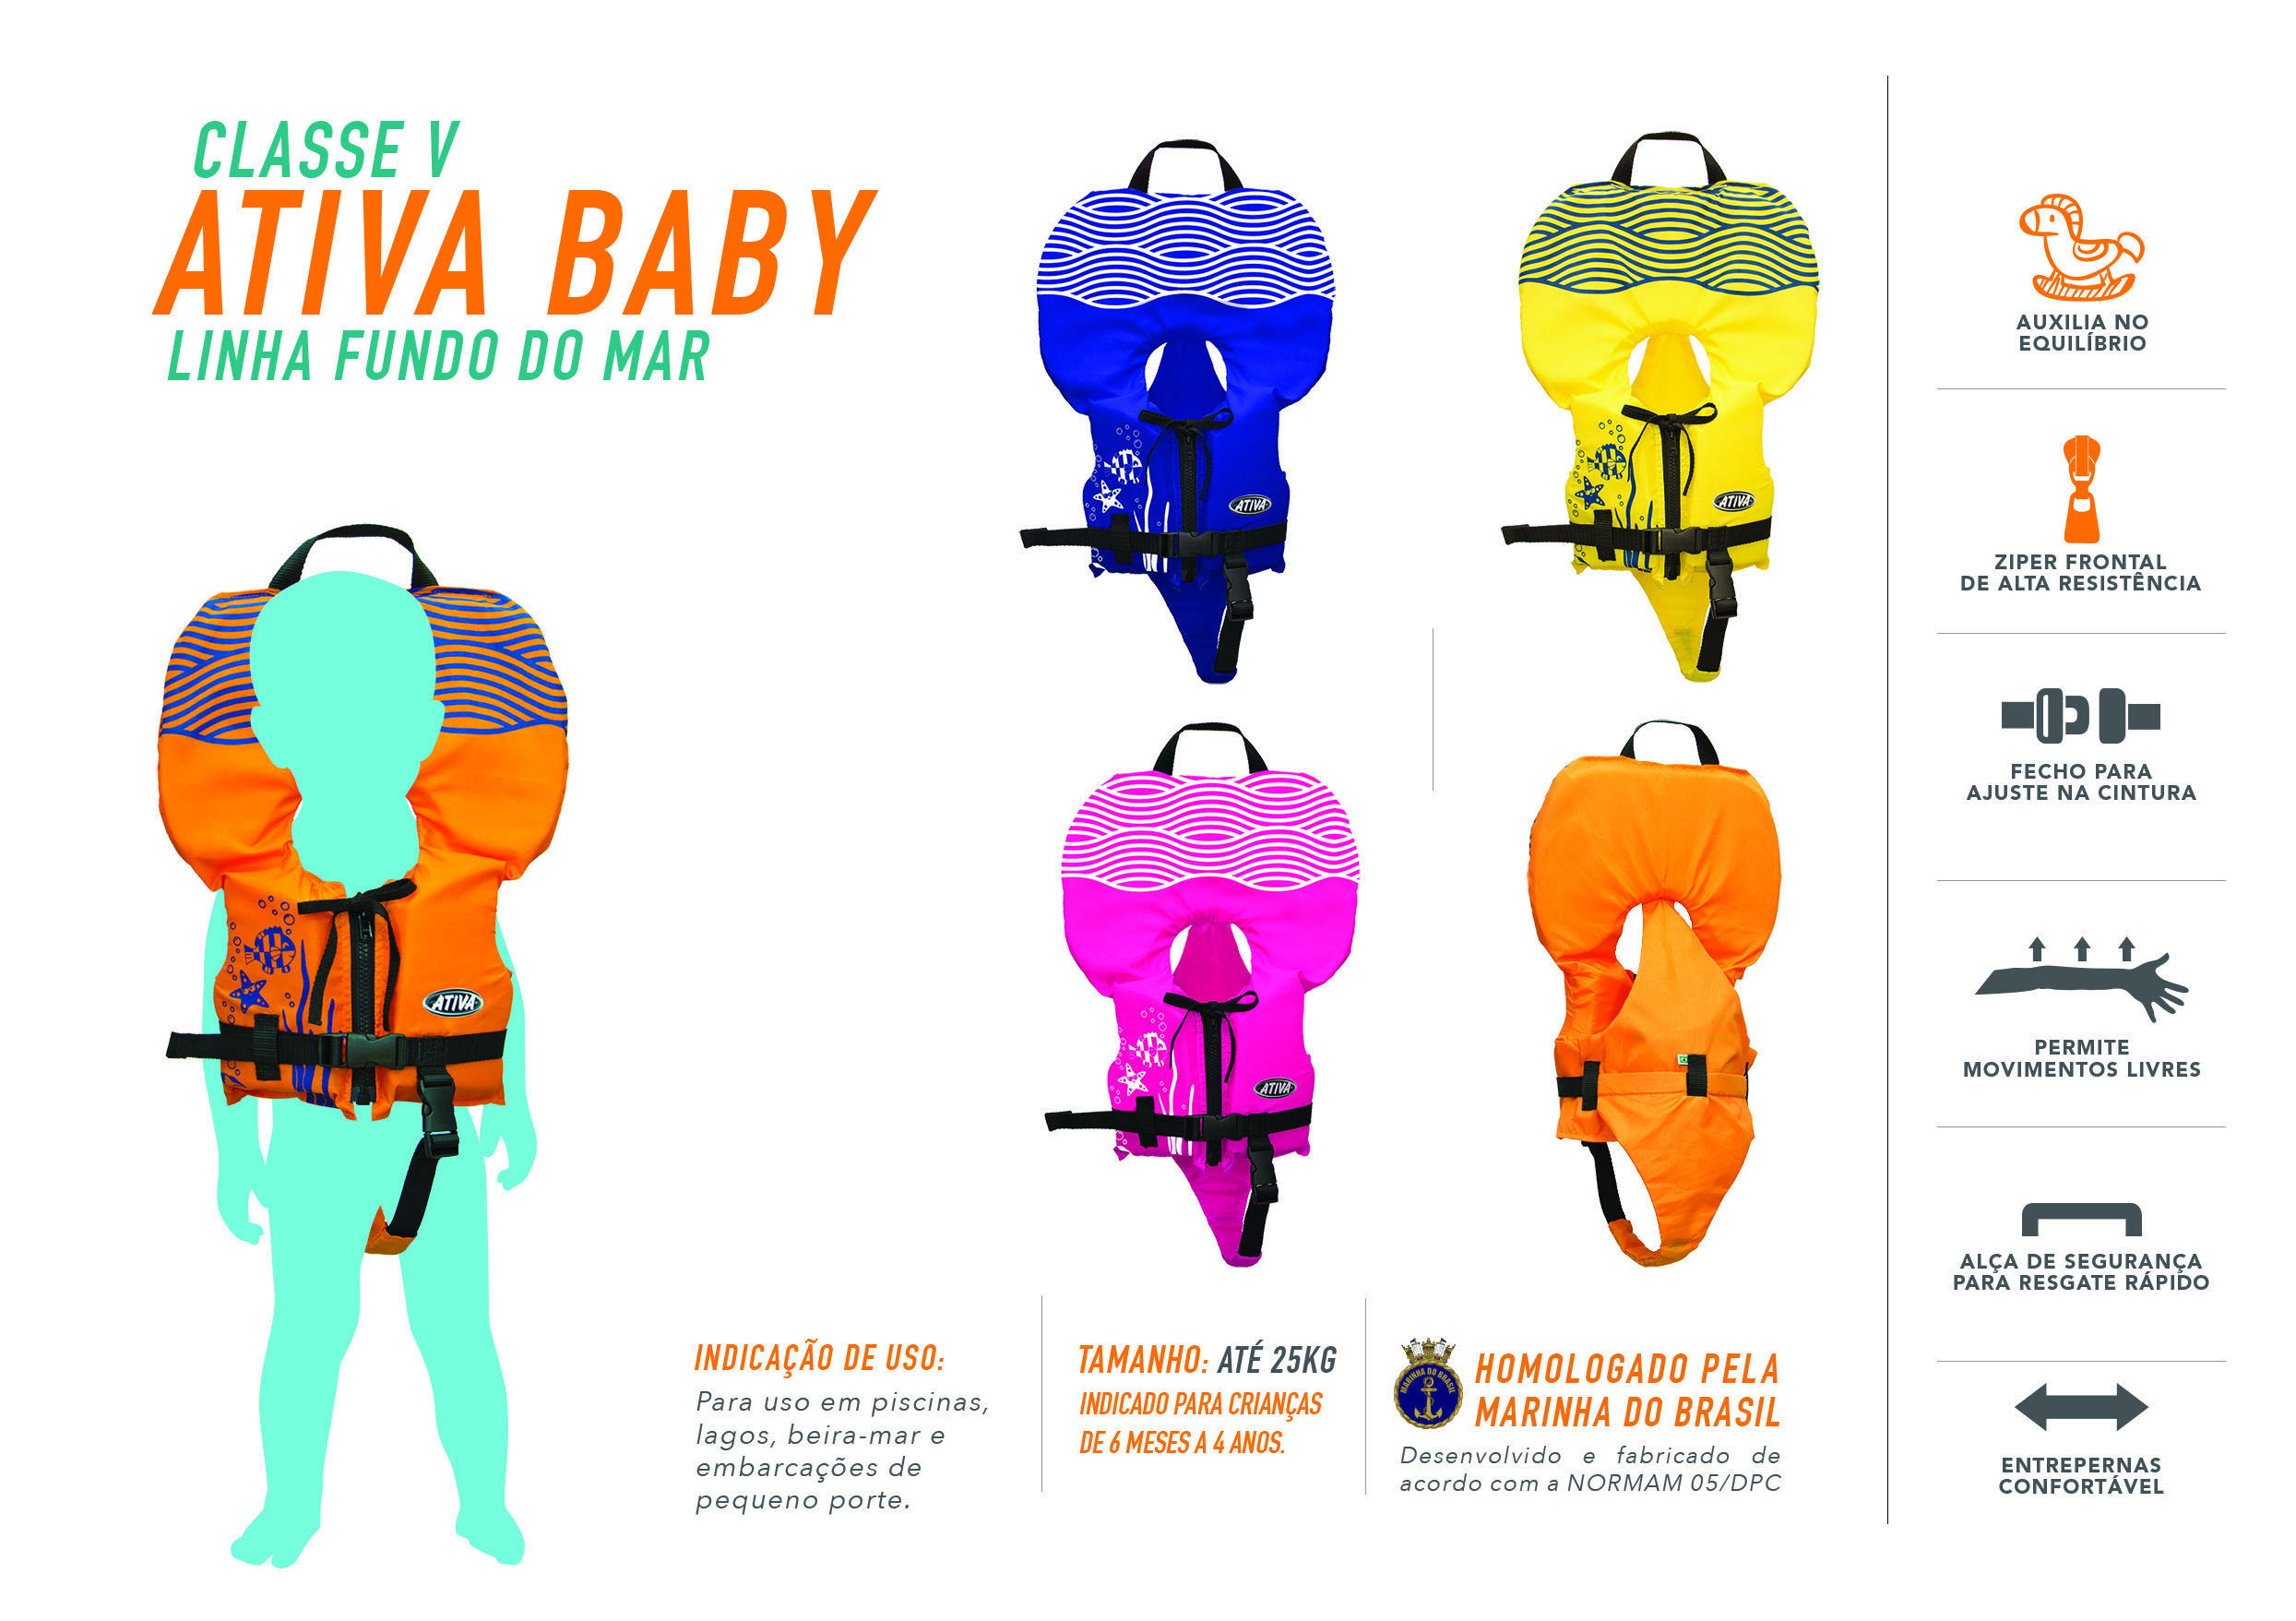 Ativa Baby